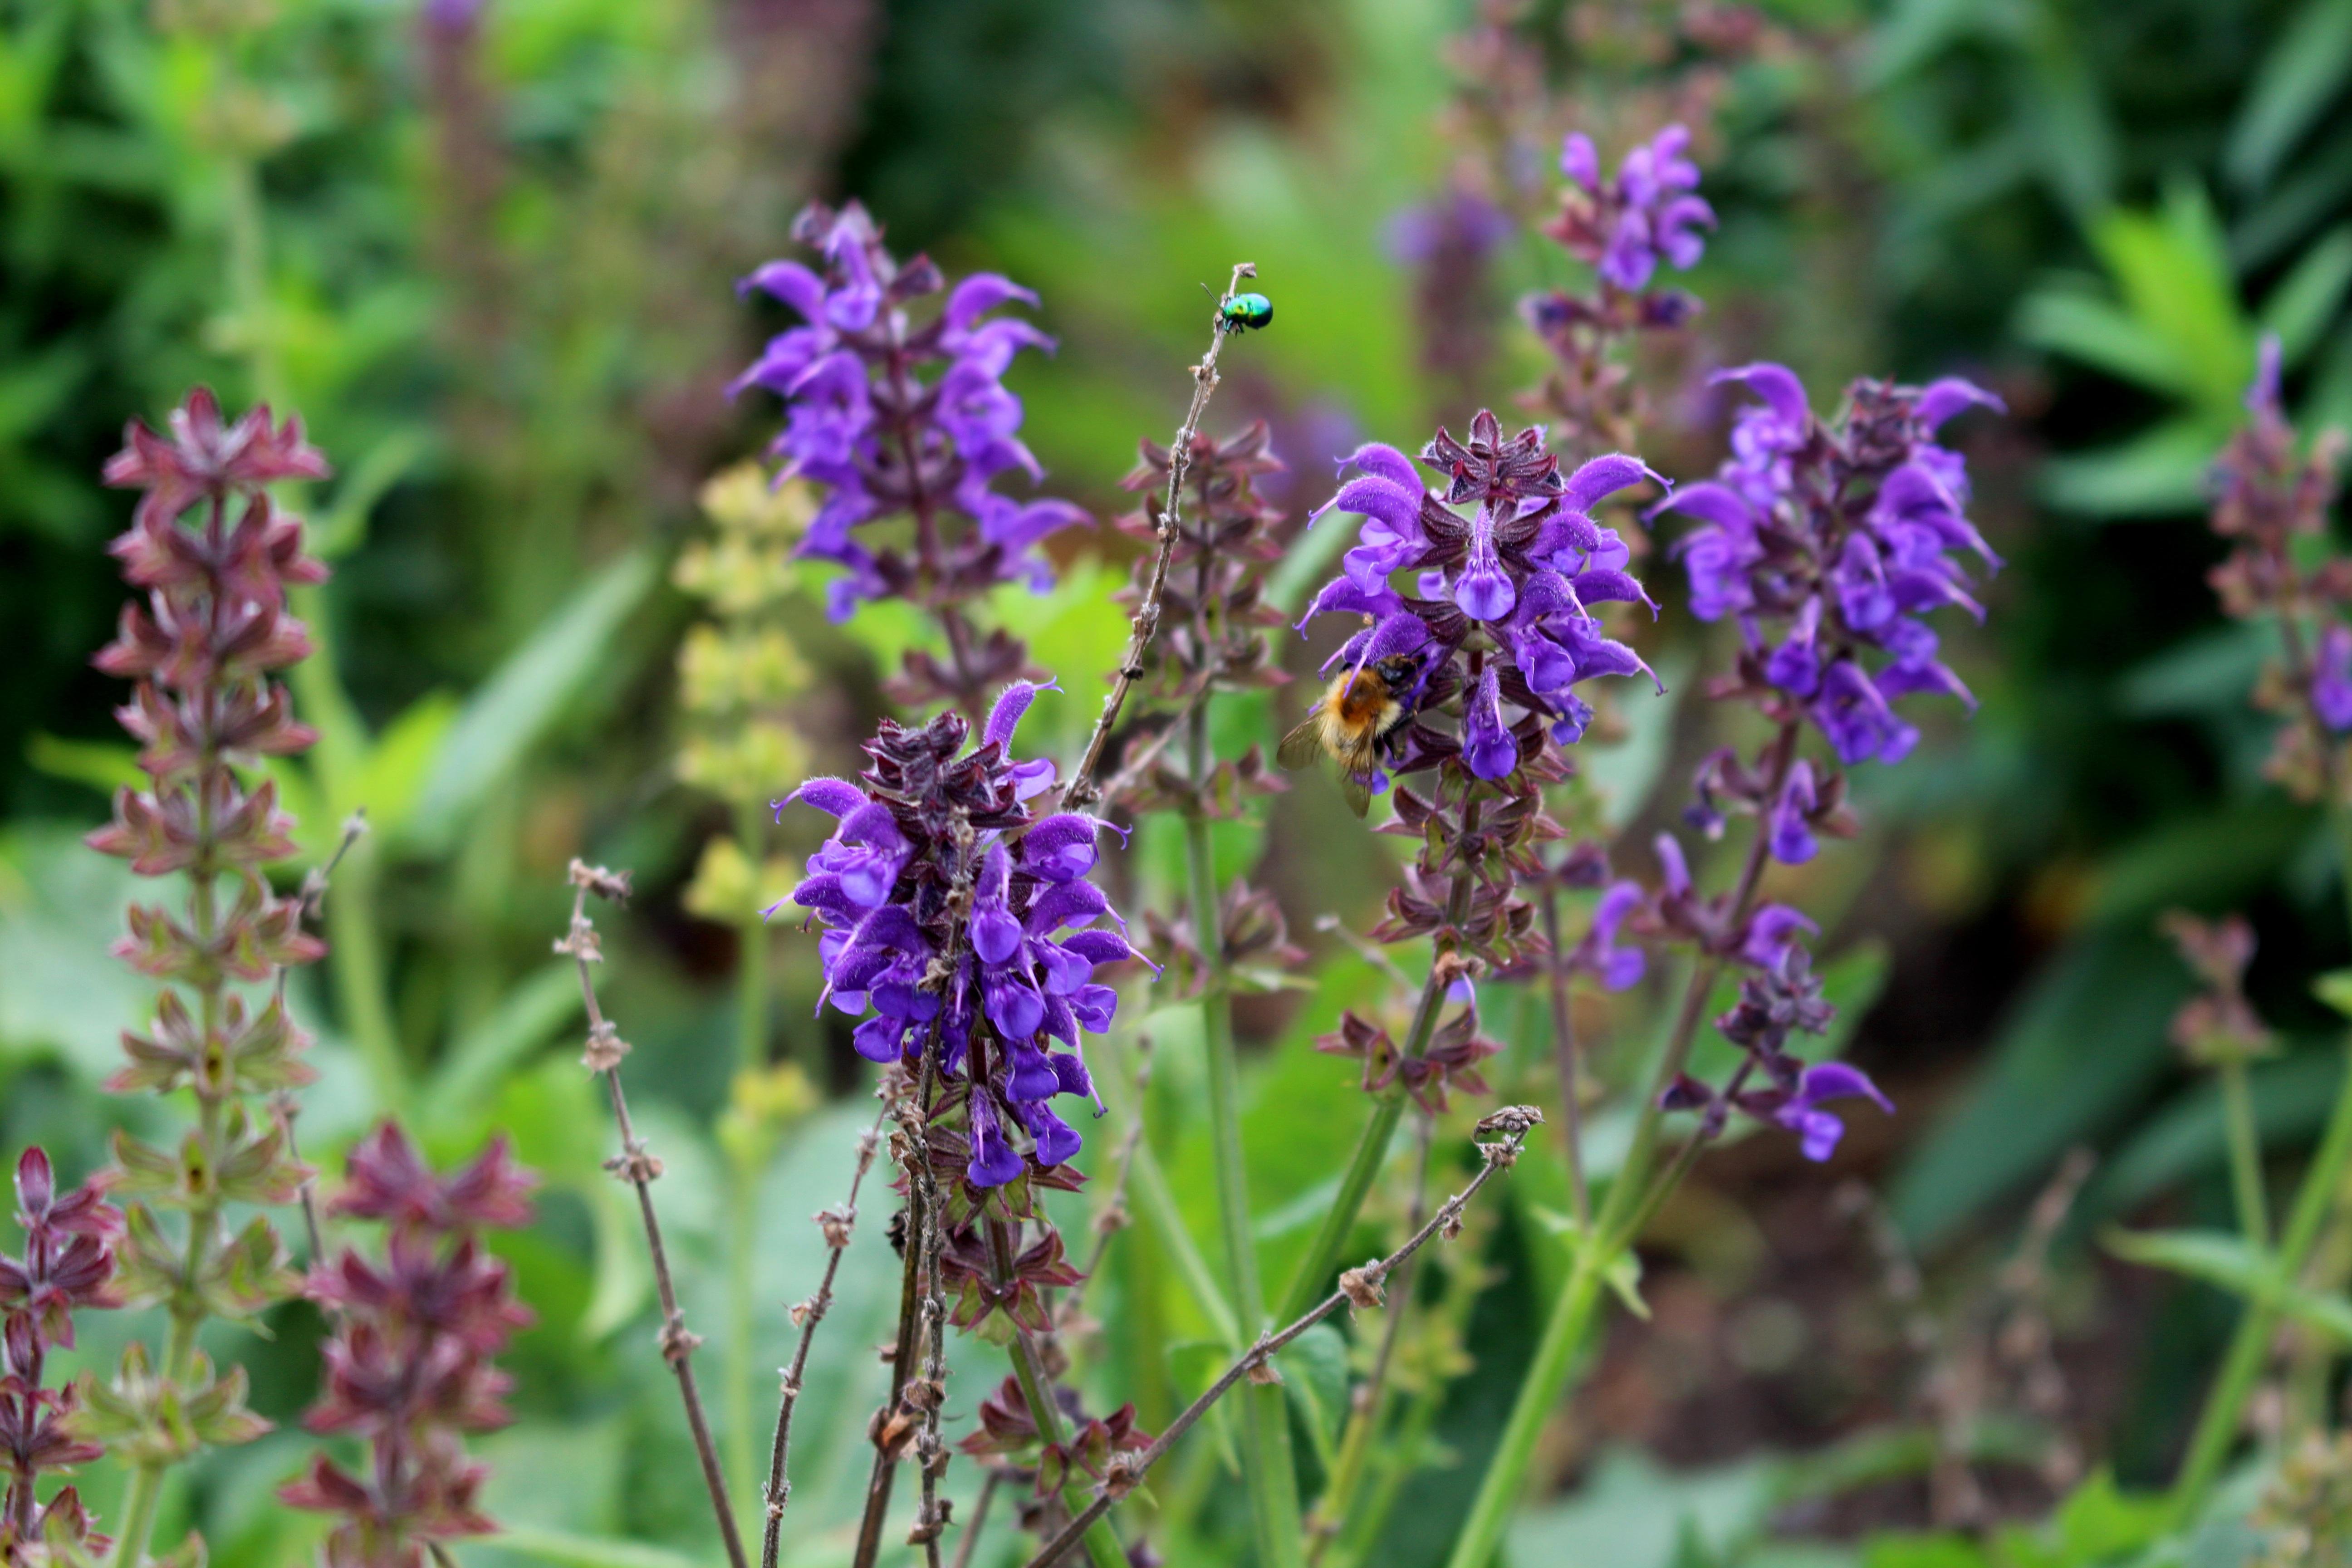 kostenlose foto bl hen wiese pr rie blatt blume lila tier sommer gr n kraut insekt. Black Bedroom Furniture Sets. Home Design Ideas